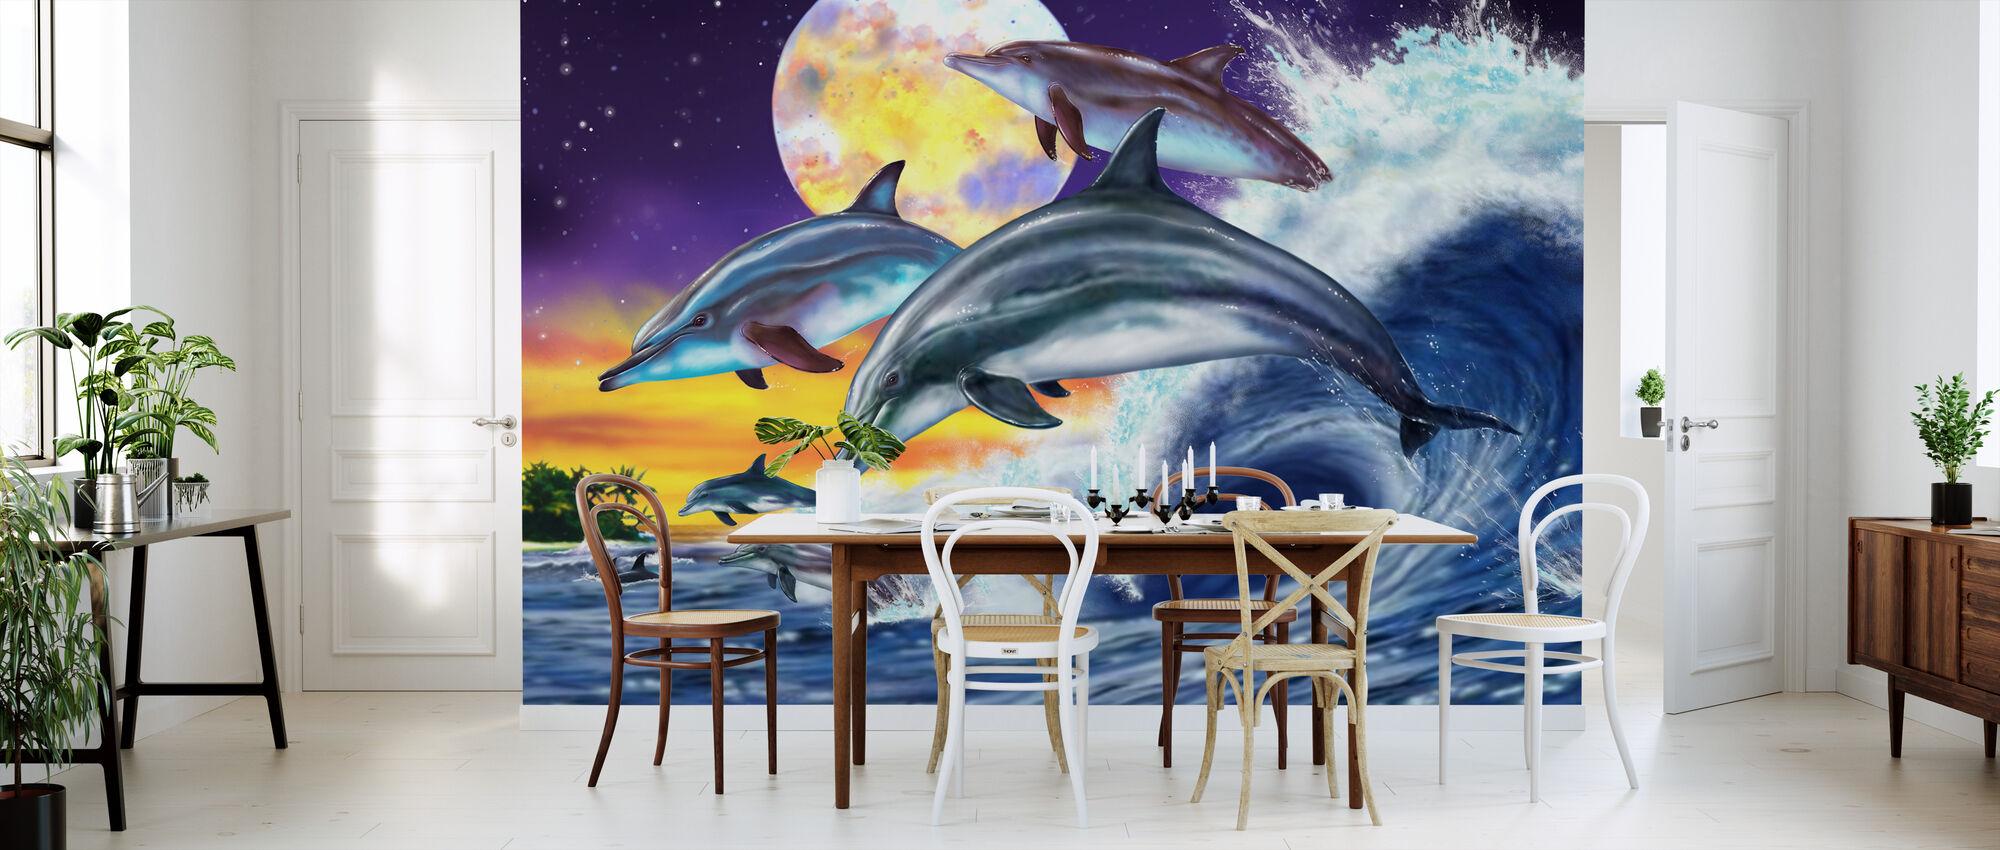 Dolphins - Wallpaper - Kitchen